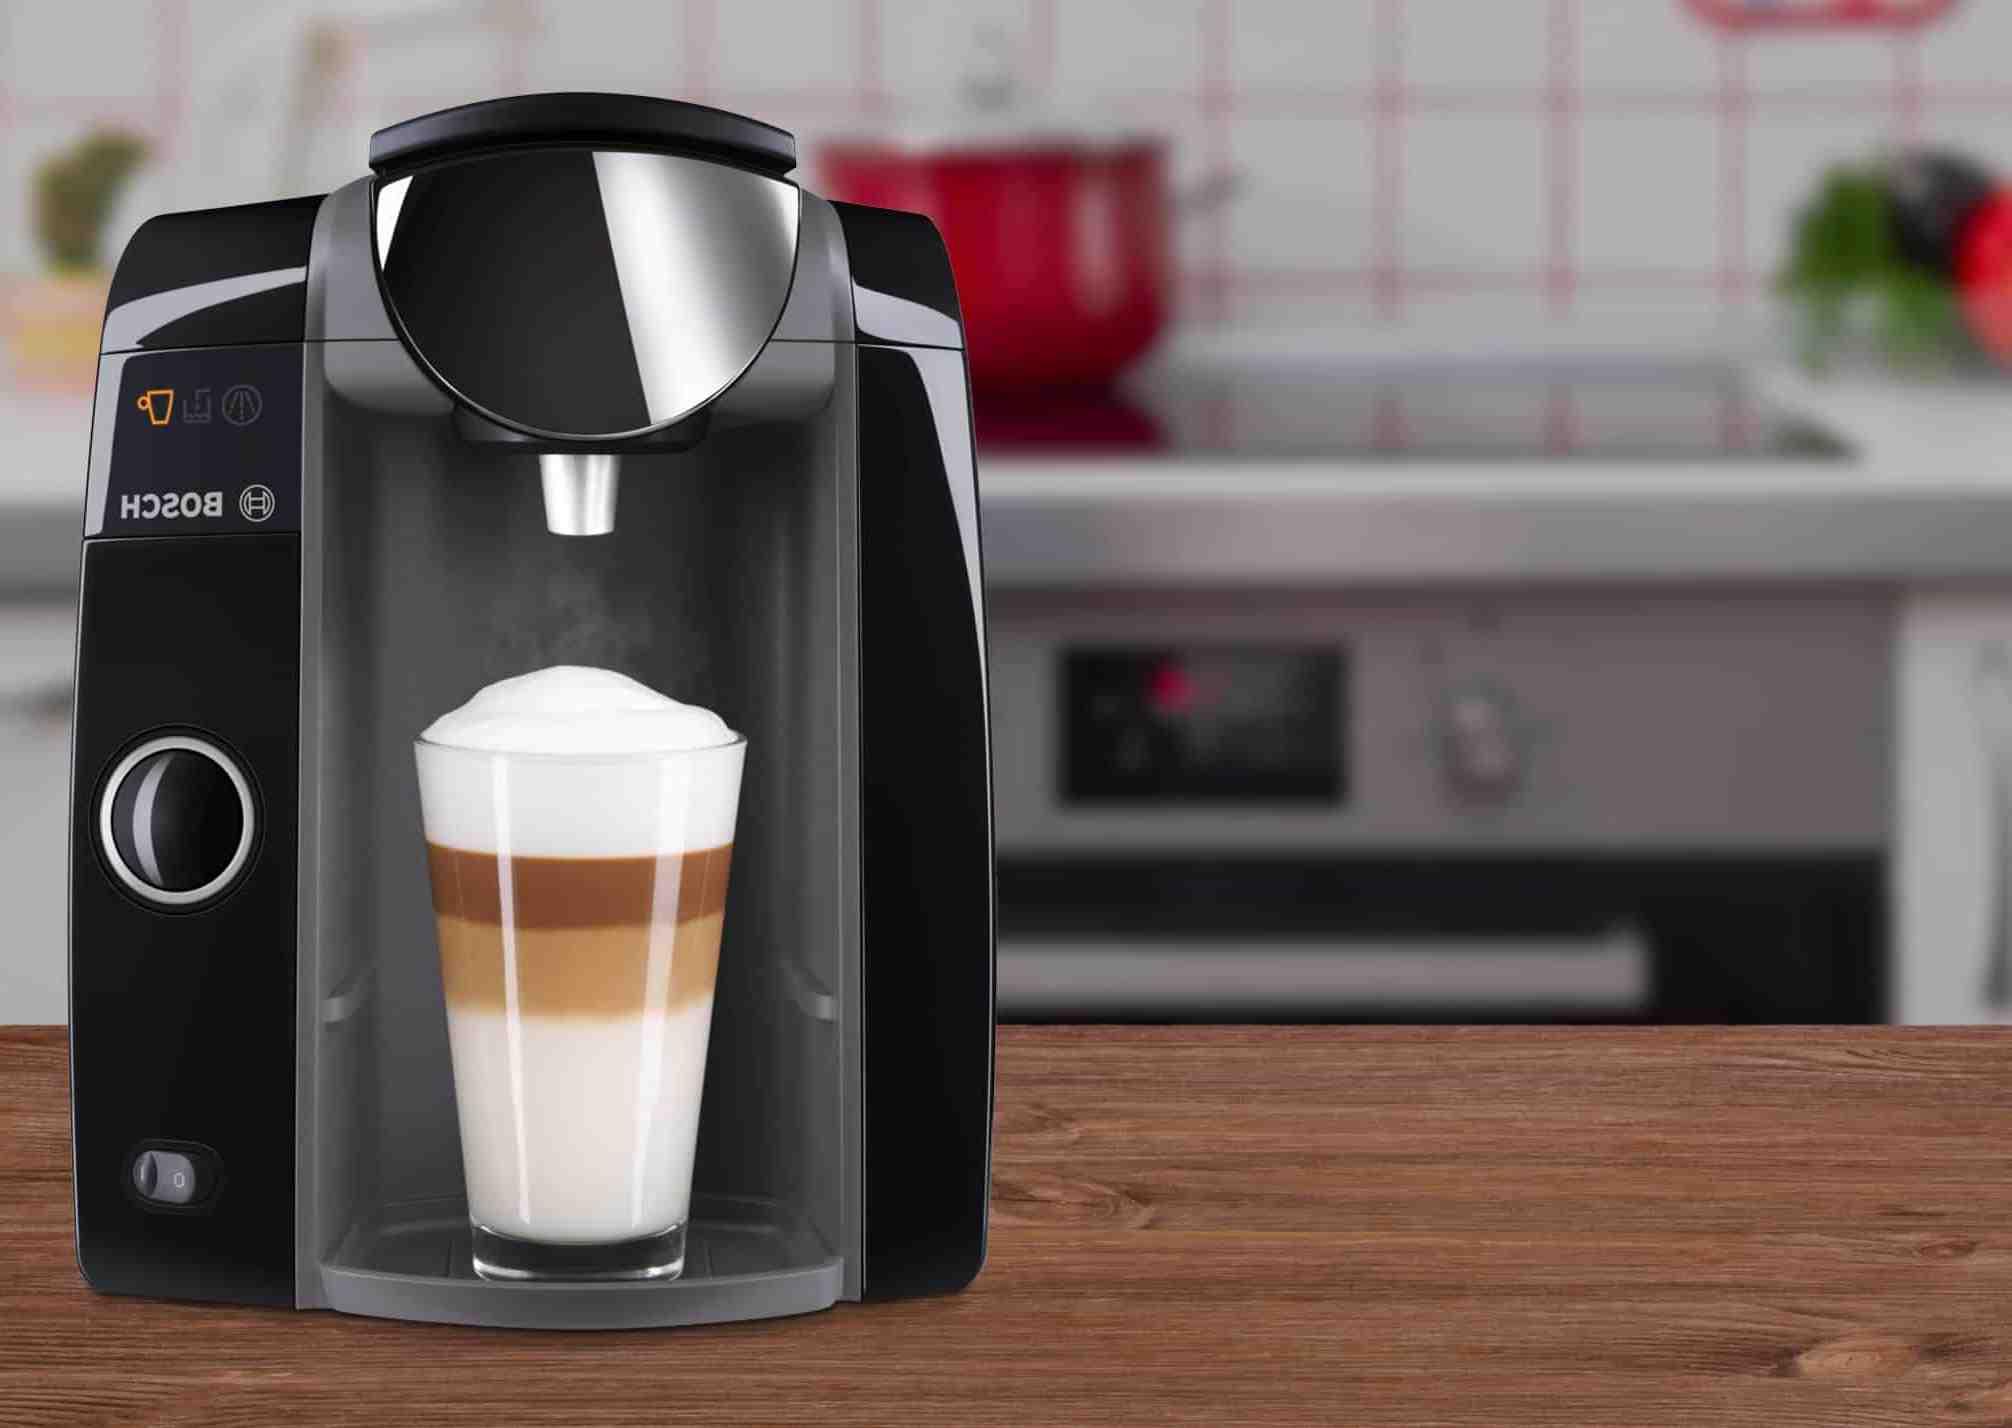 Comment utiliser un cafe tassimo cafe ?